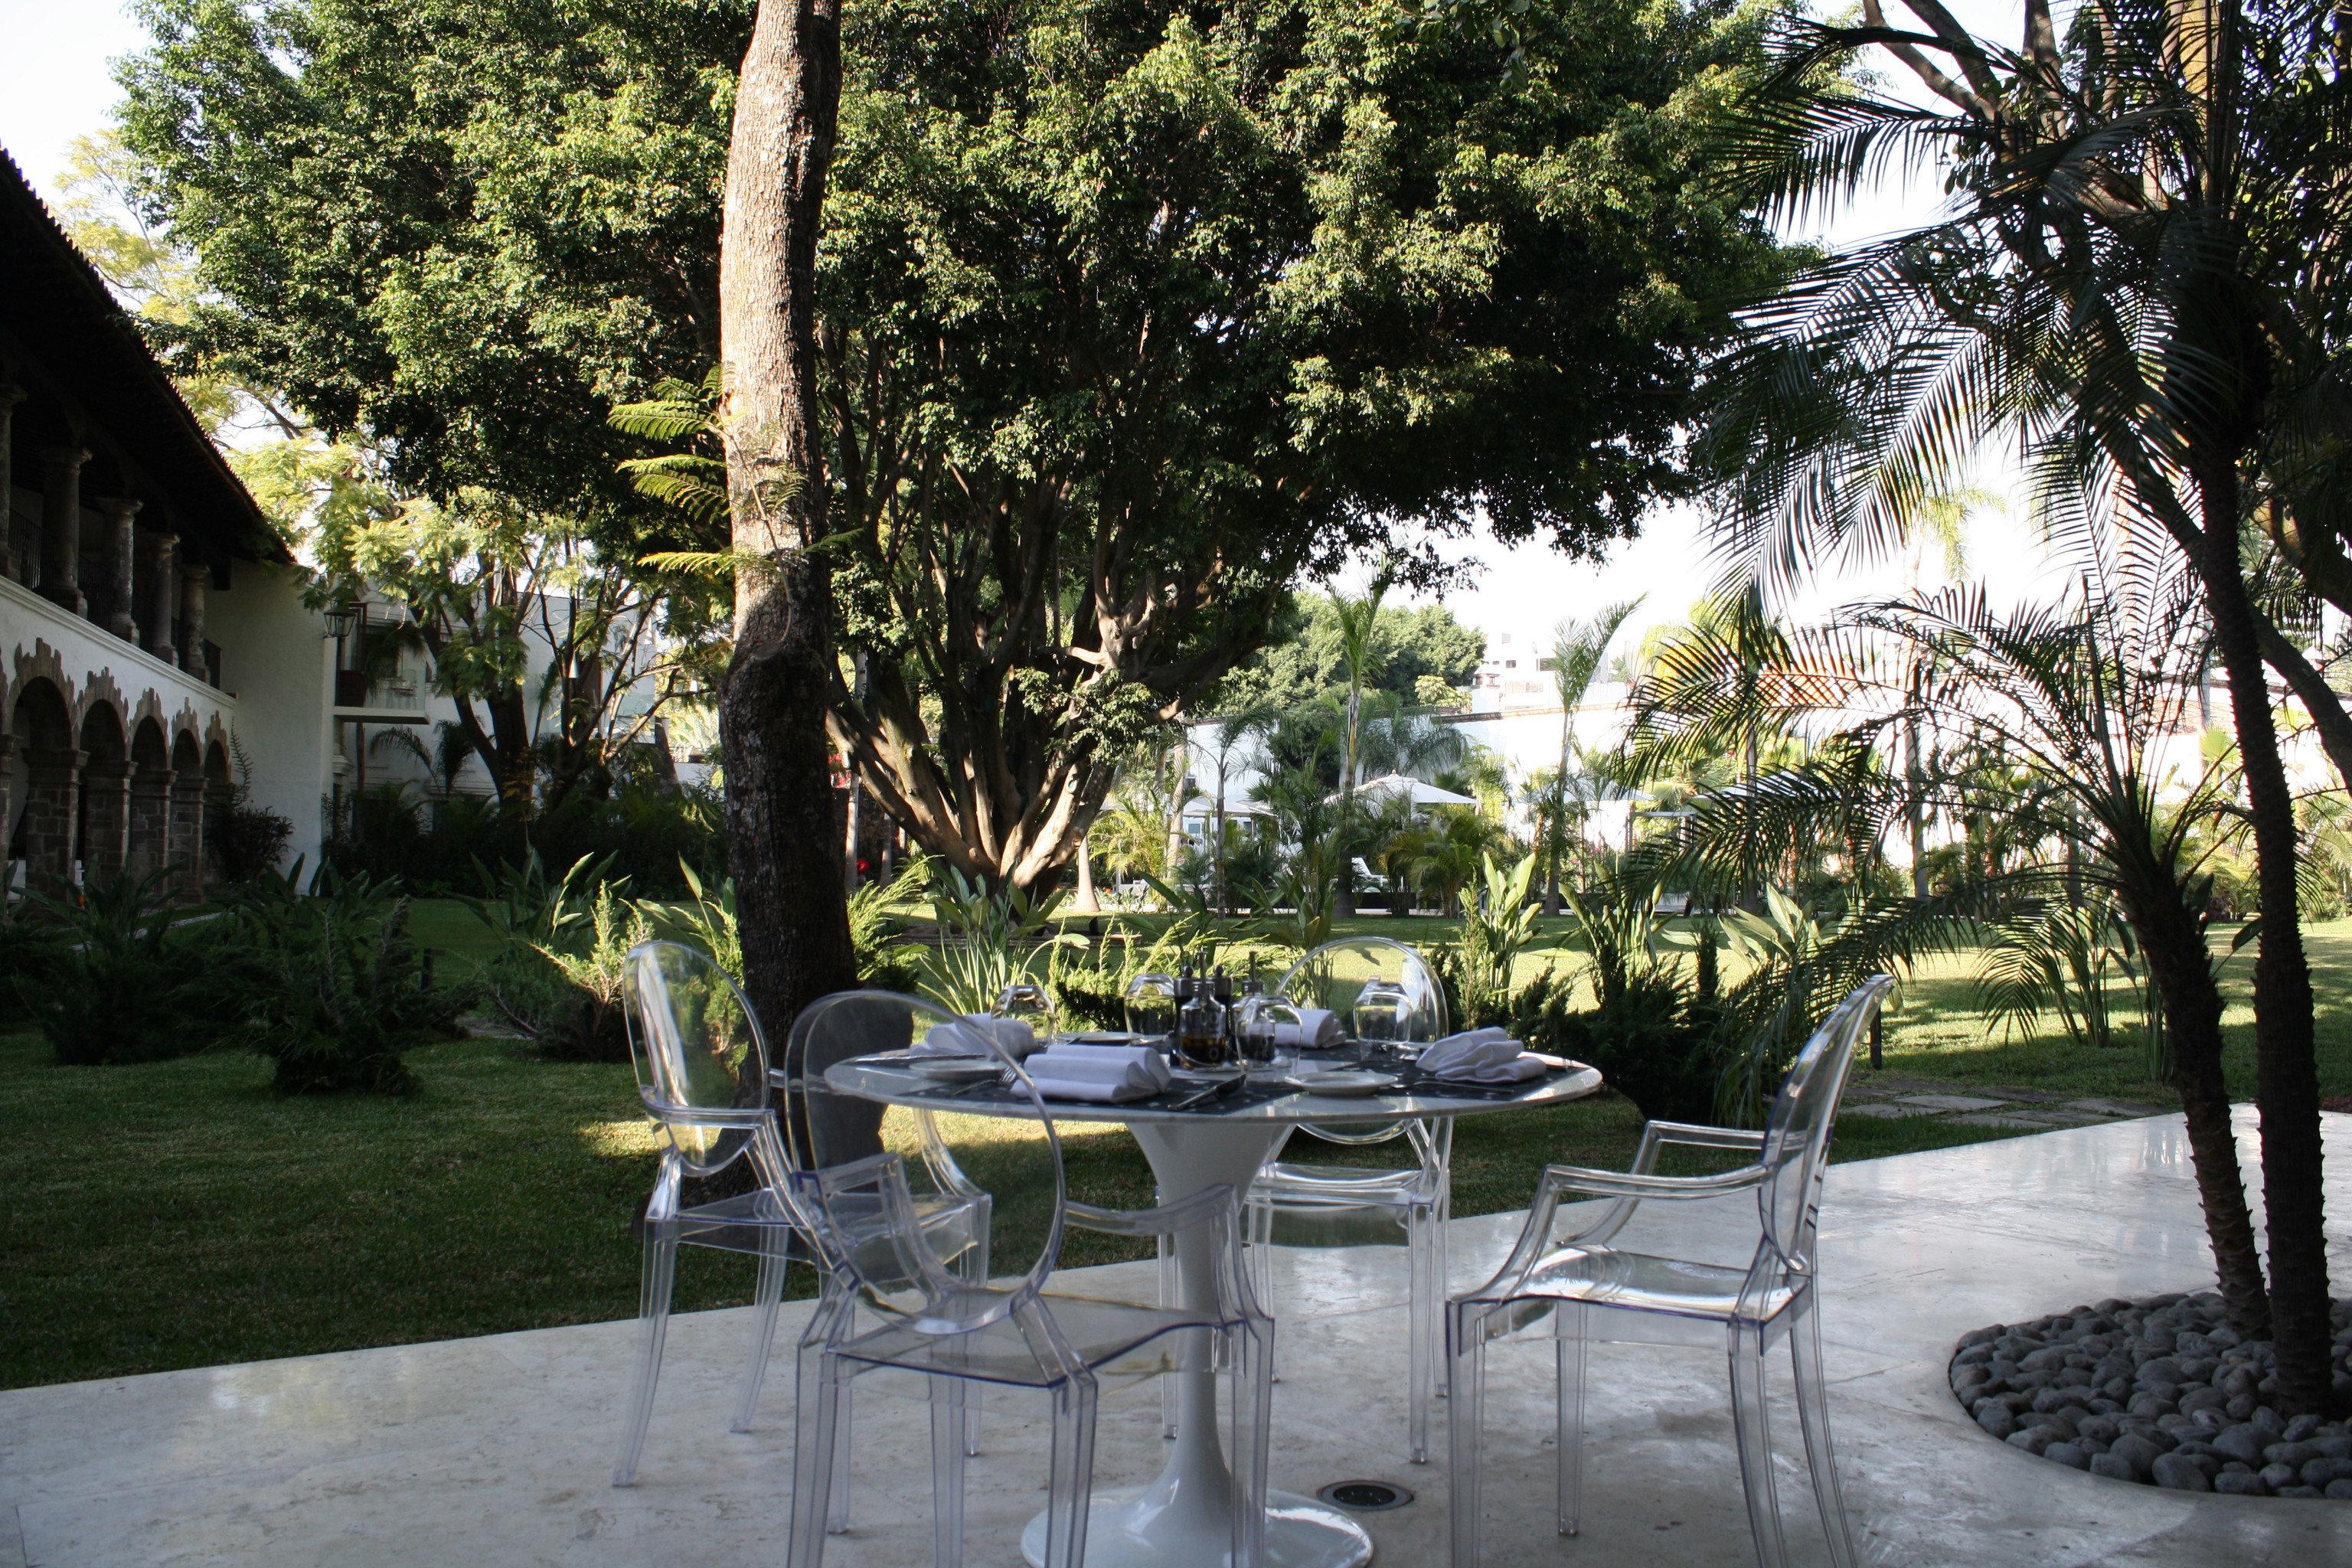 tree property Resort restaurant Courtyard backyard home Garden Villa park lawn hacienda plant set